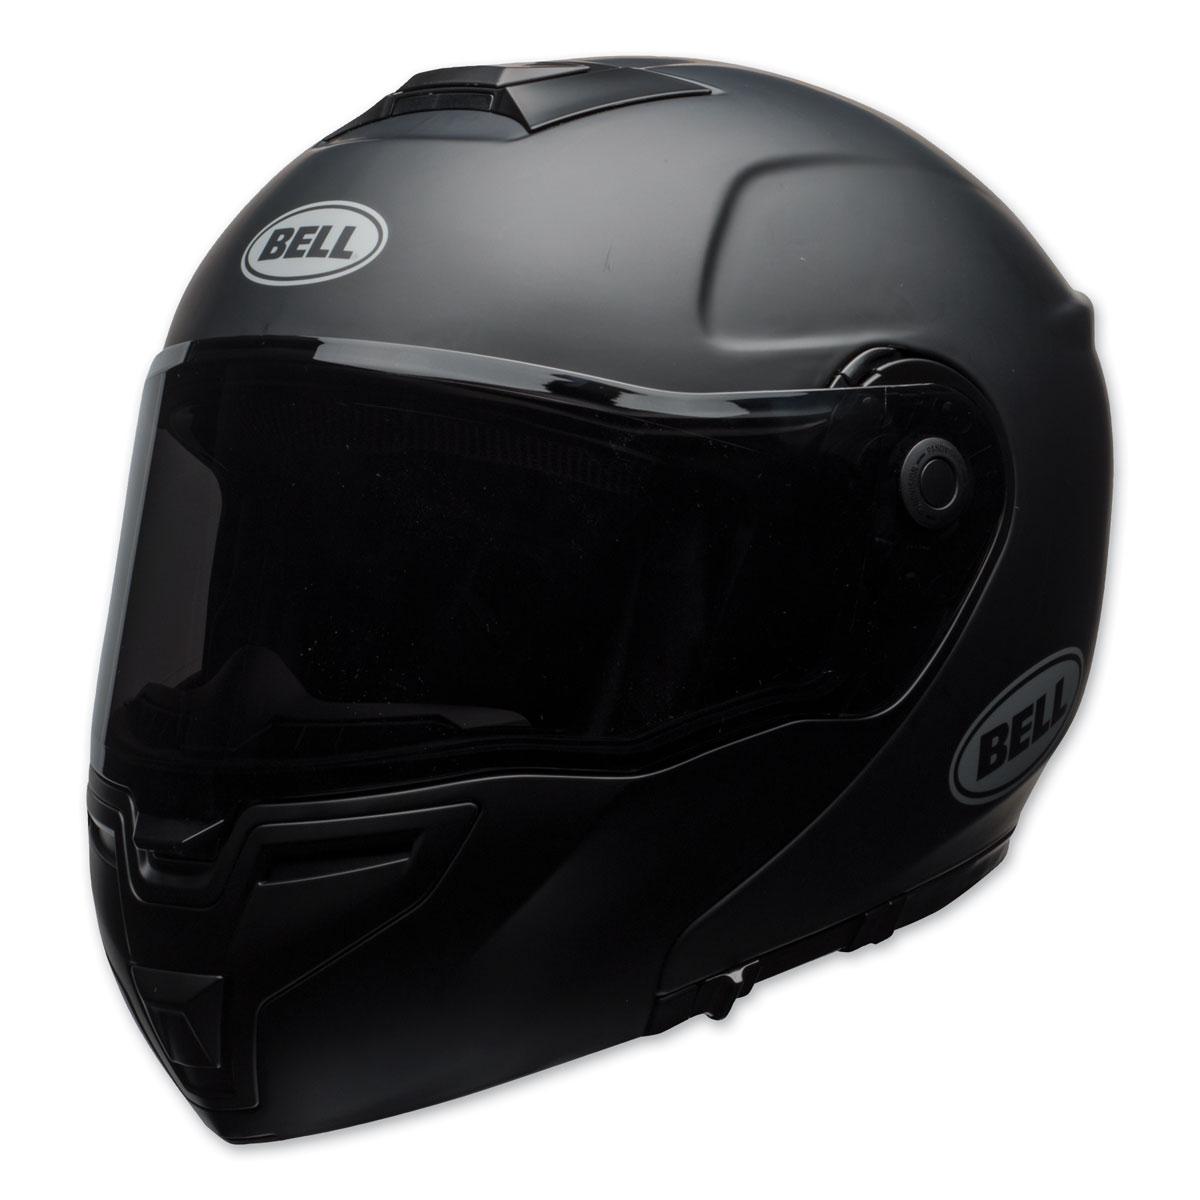 Bell SRT Matte Black Modular Helmet